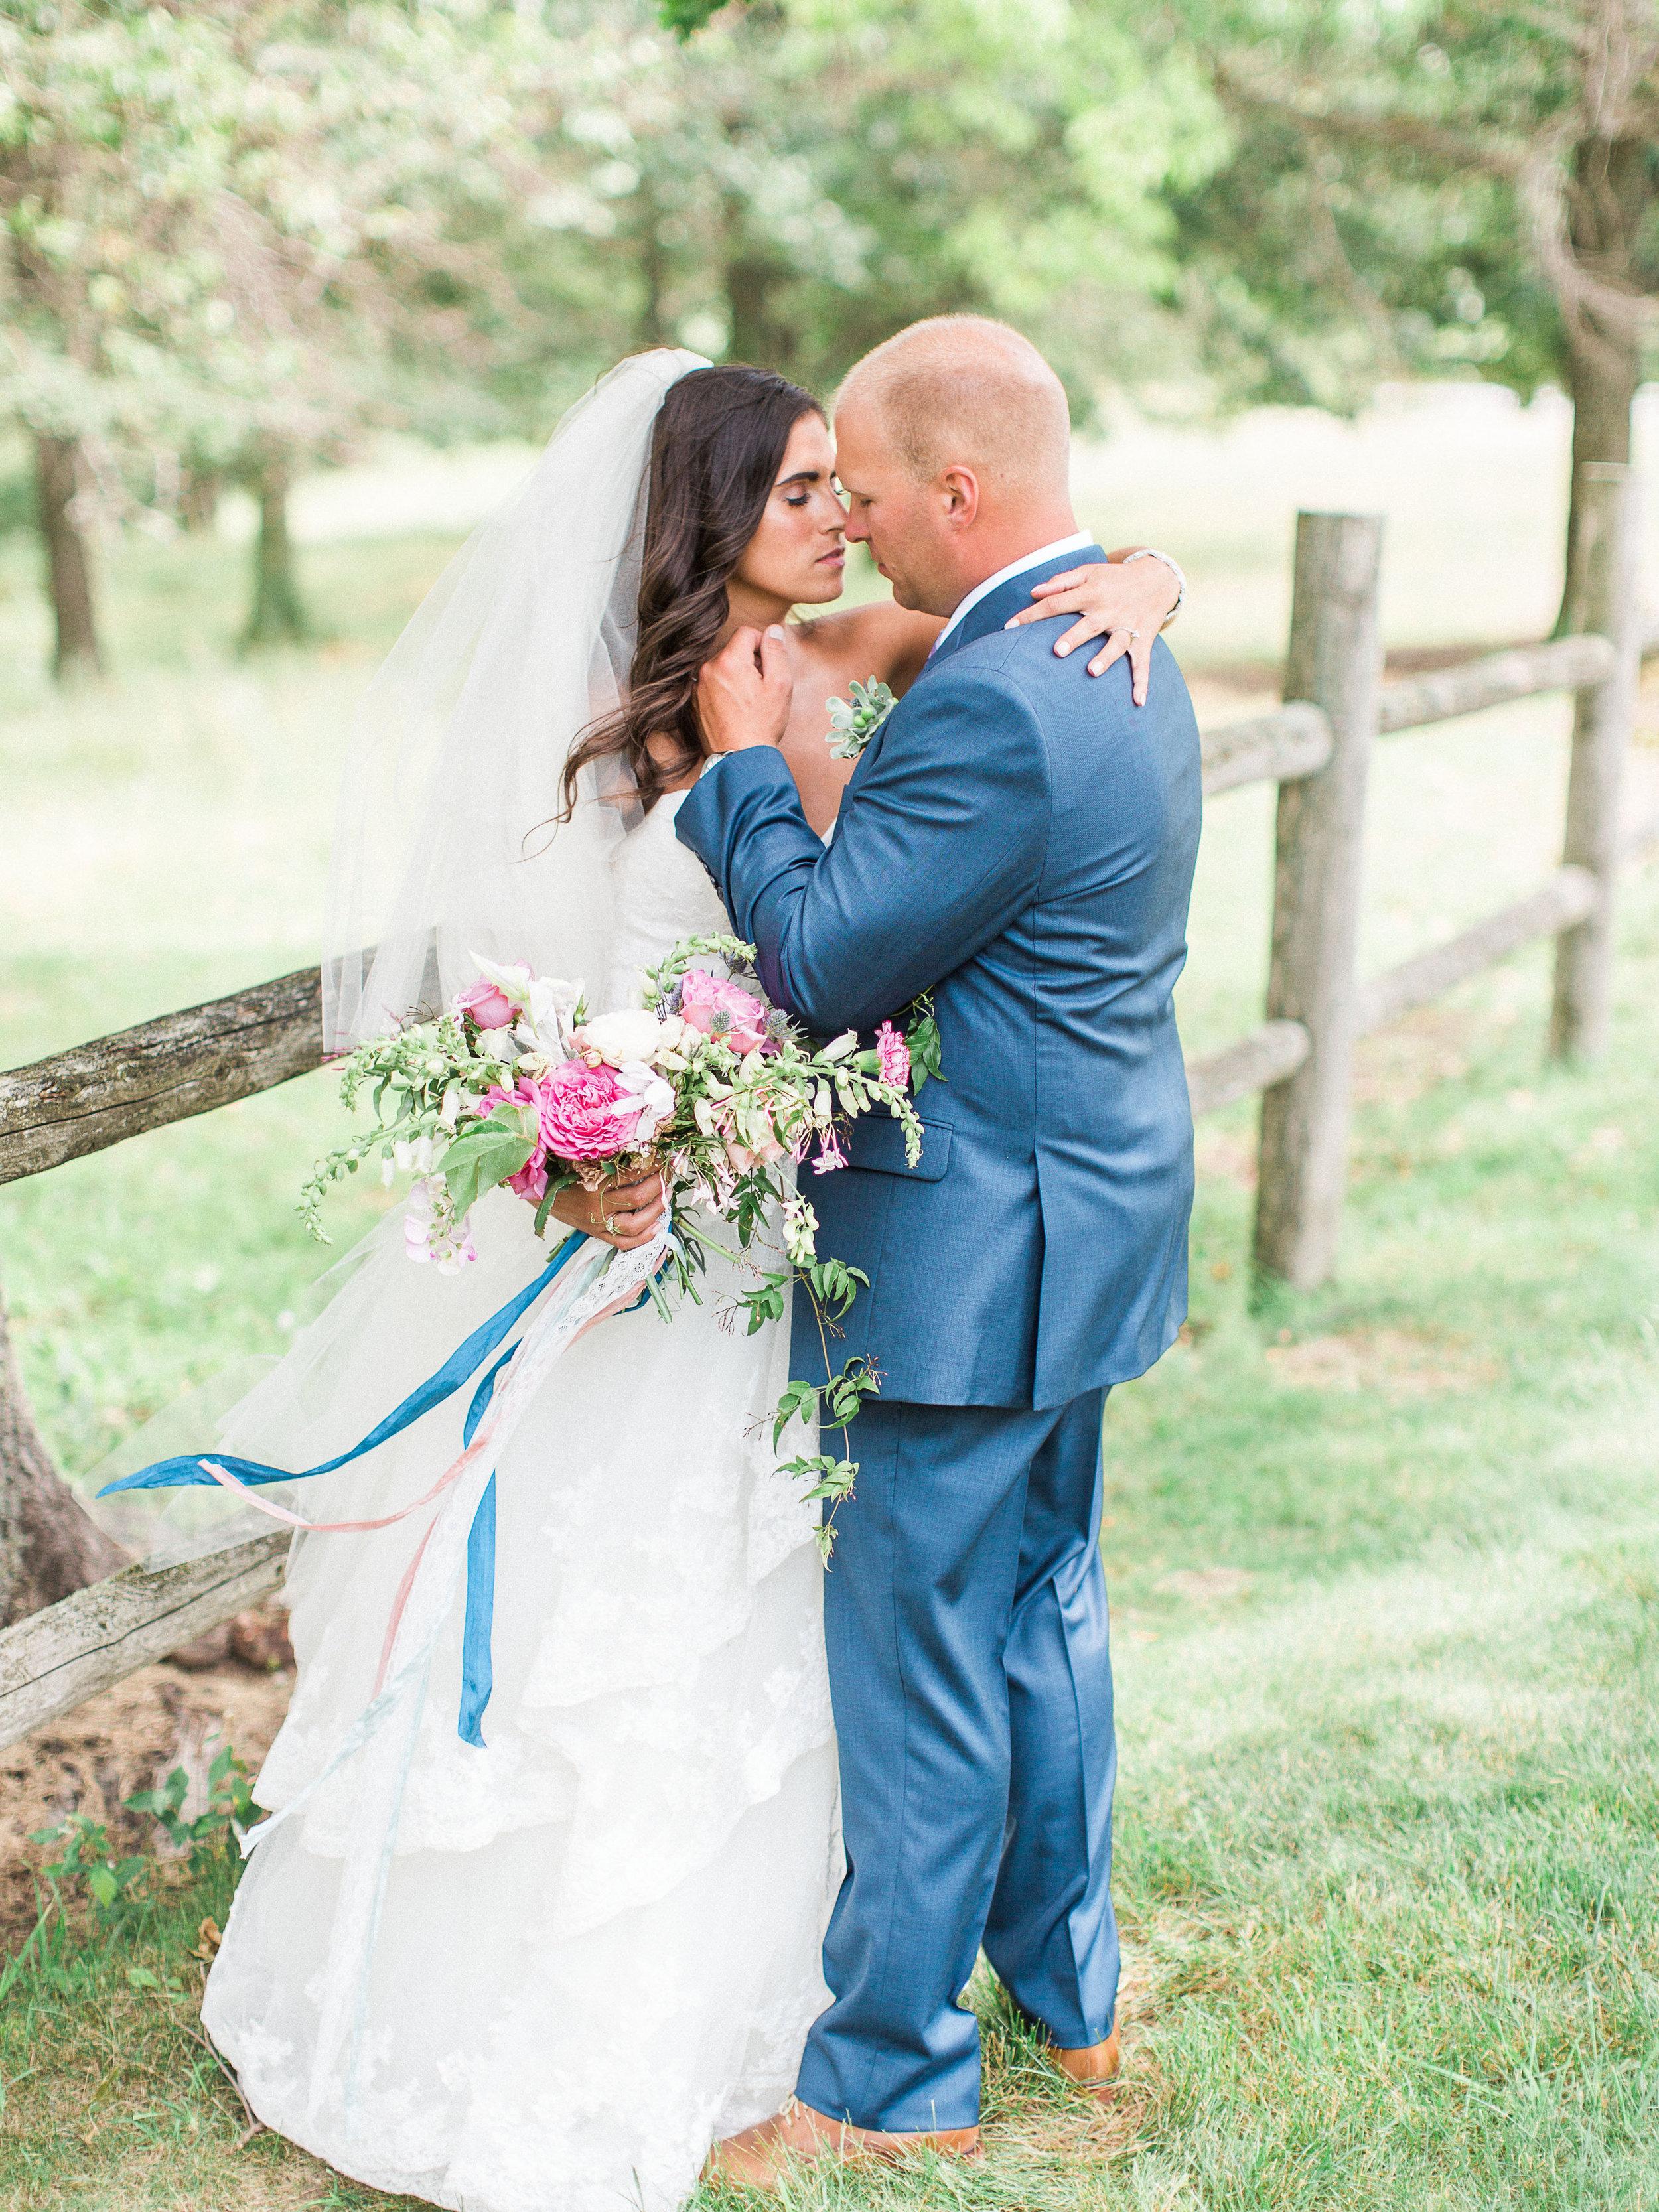 ERIC AND HALLIE WEDDING-HI RESOLUTION FOR PRINTING-0429.jpg